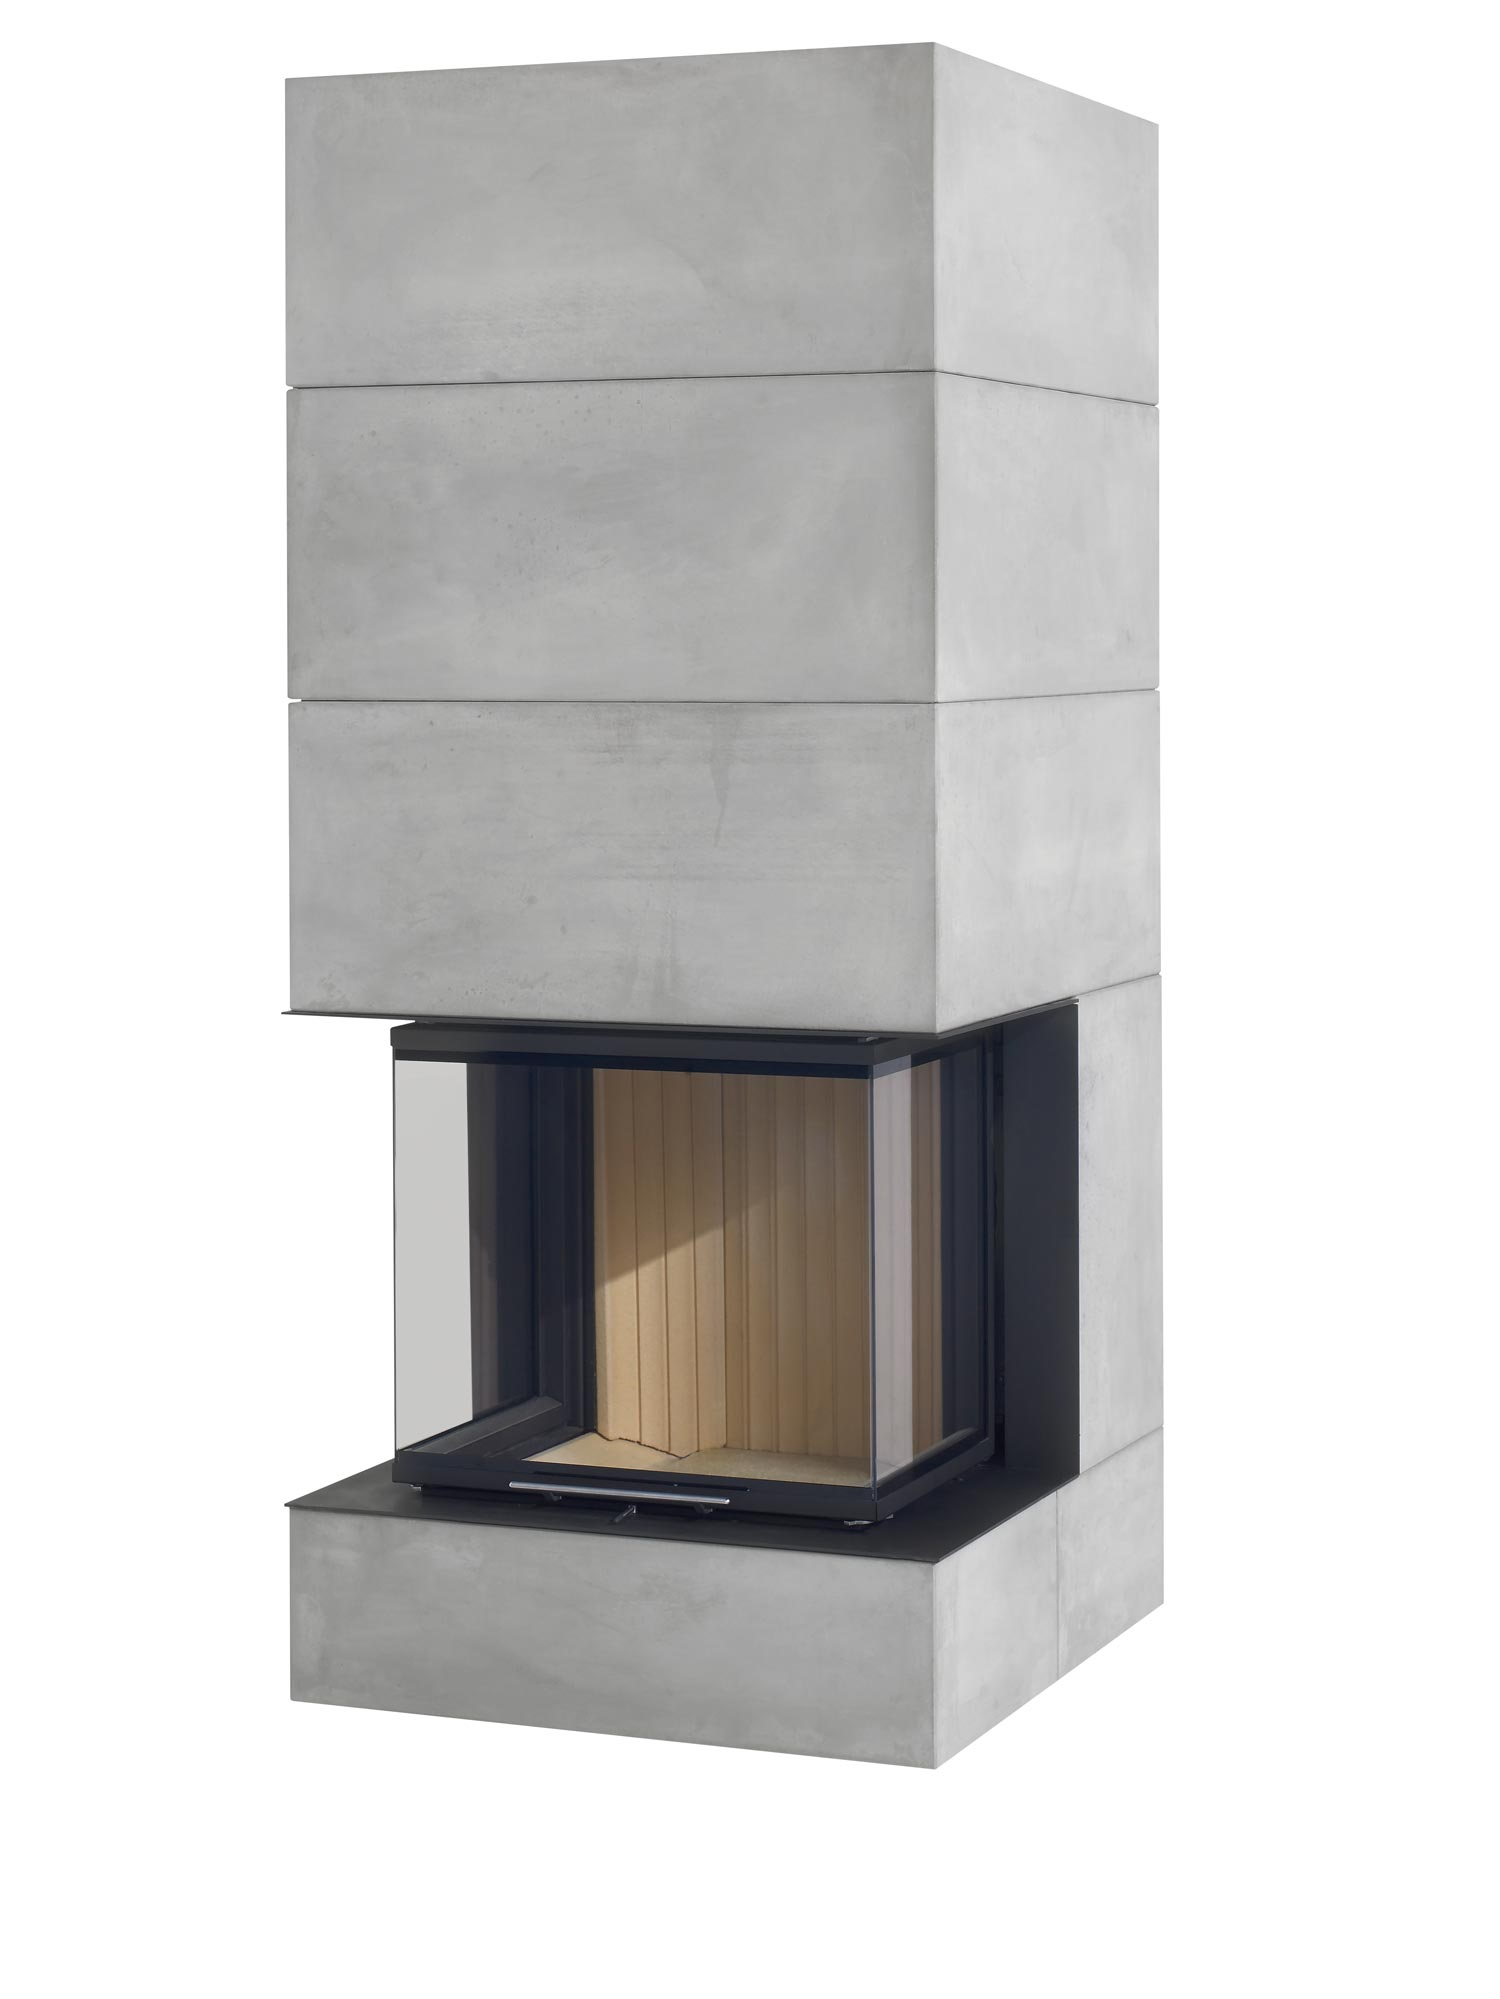 kaminbausatz brunner bsk 05 panorama kamin schiebet r 13 kw kaufen cafiro. Black Bedroom Furniture Sets. Home Design Ideas